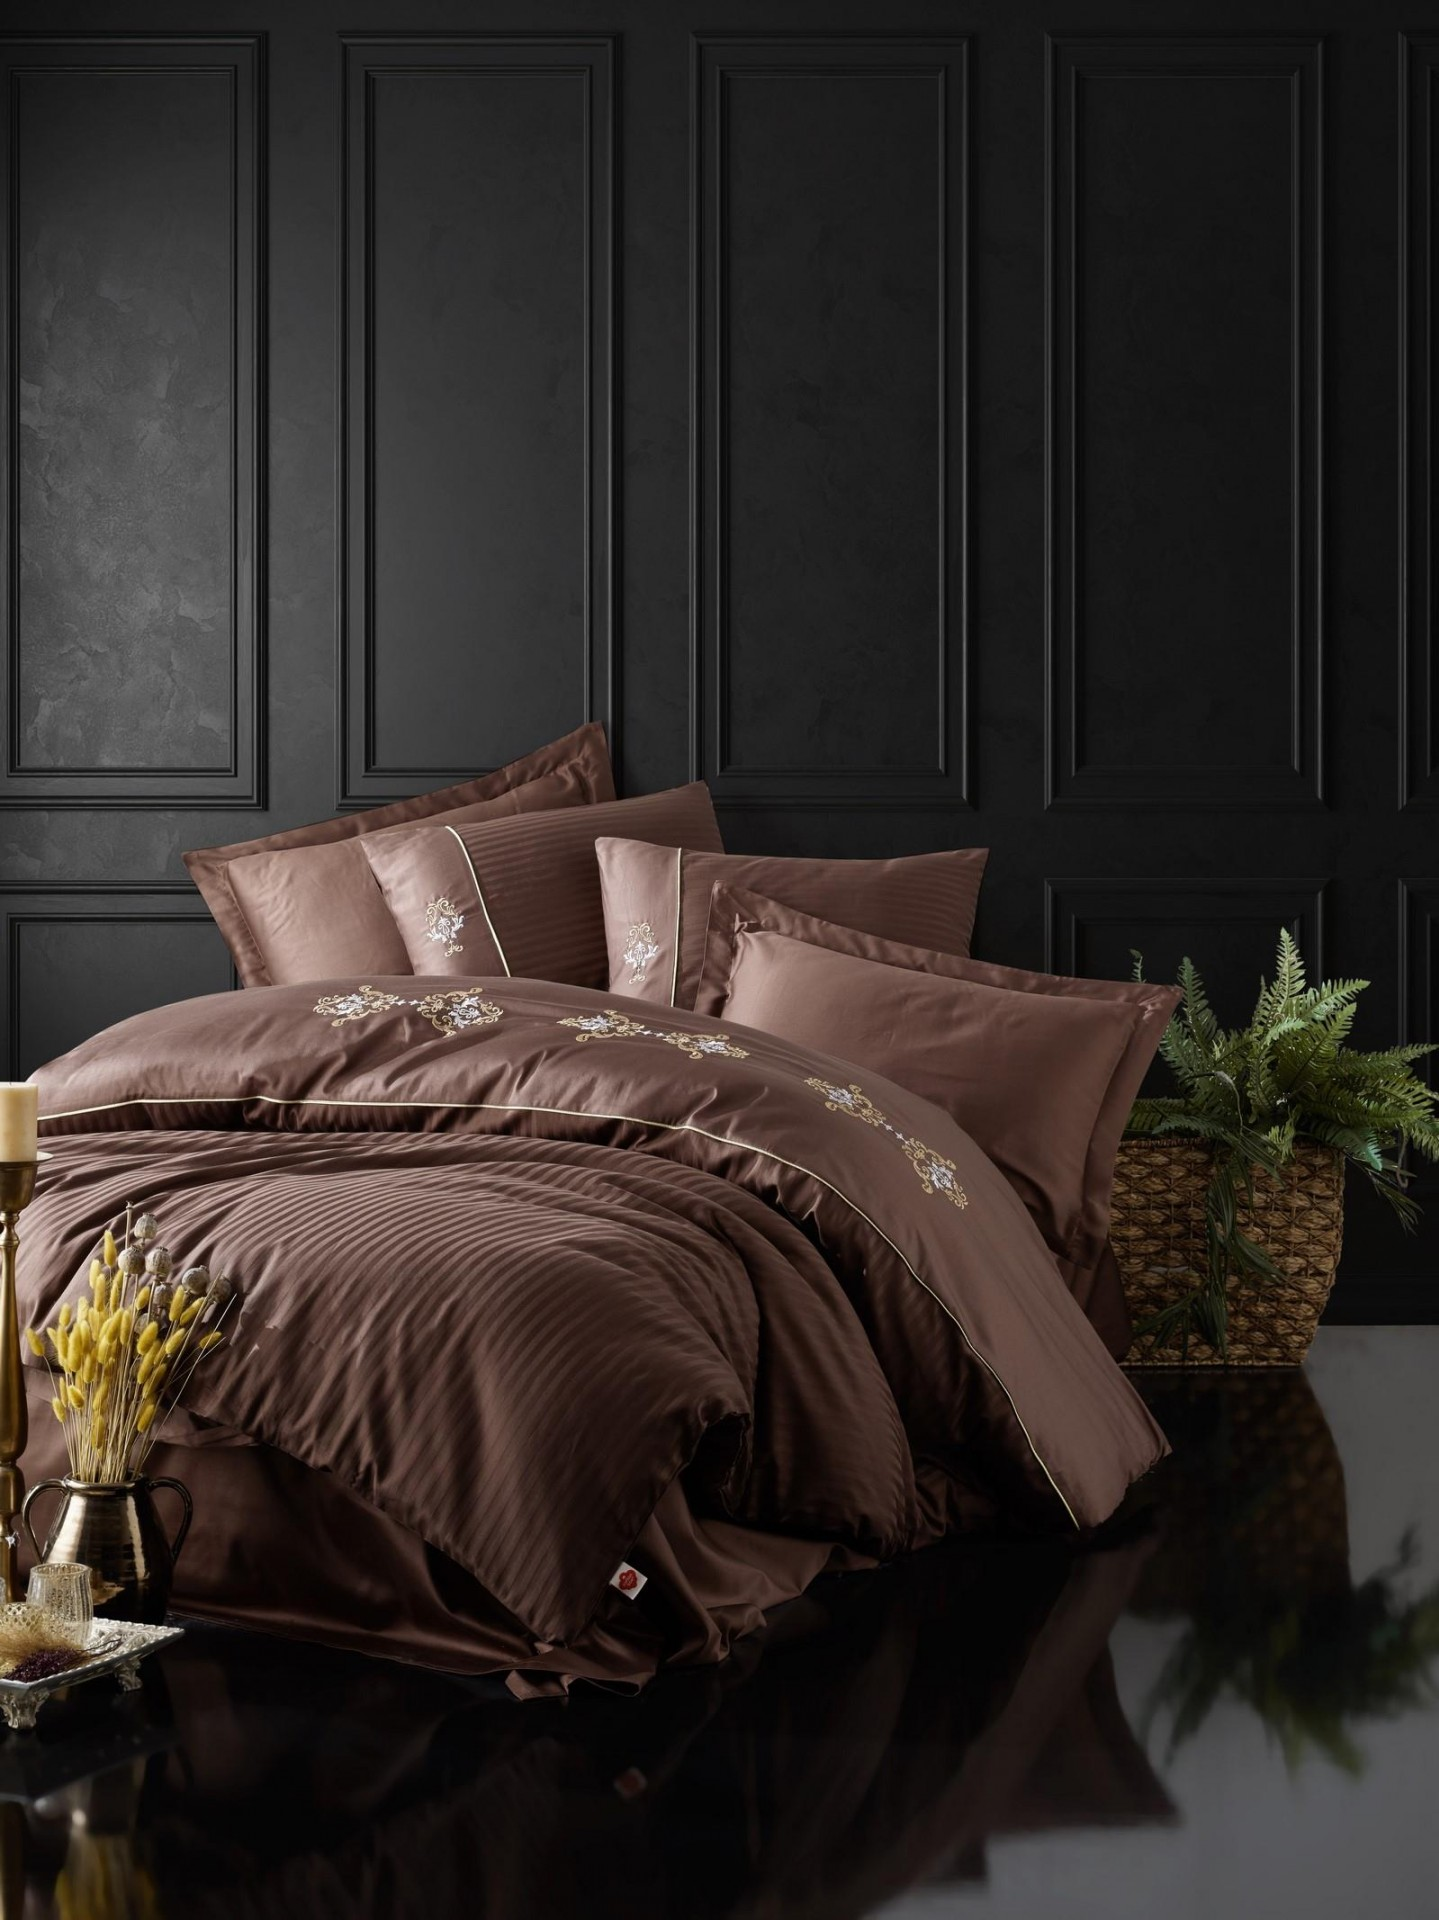 Estilo mercados luxo conjunto de cama lençol conjunto novo jogo de cama